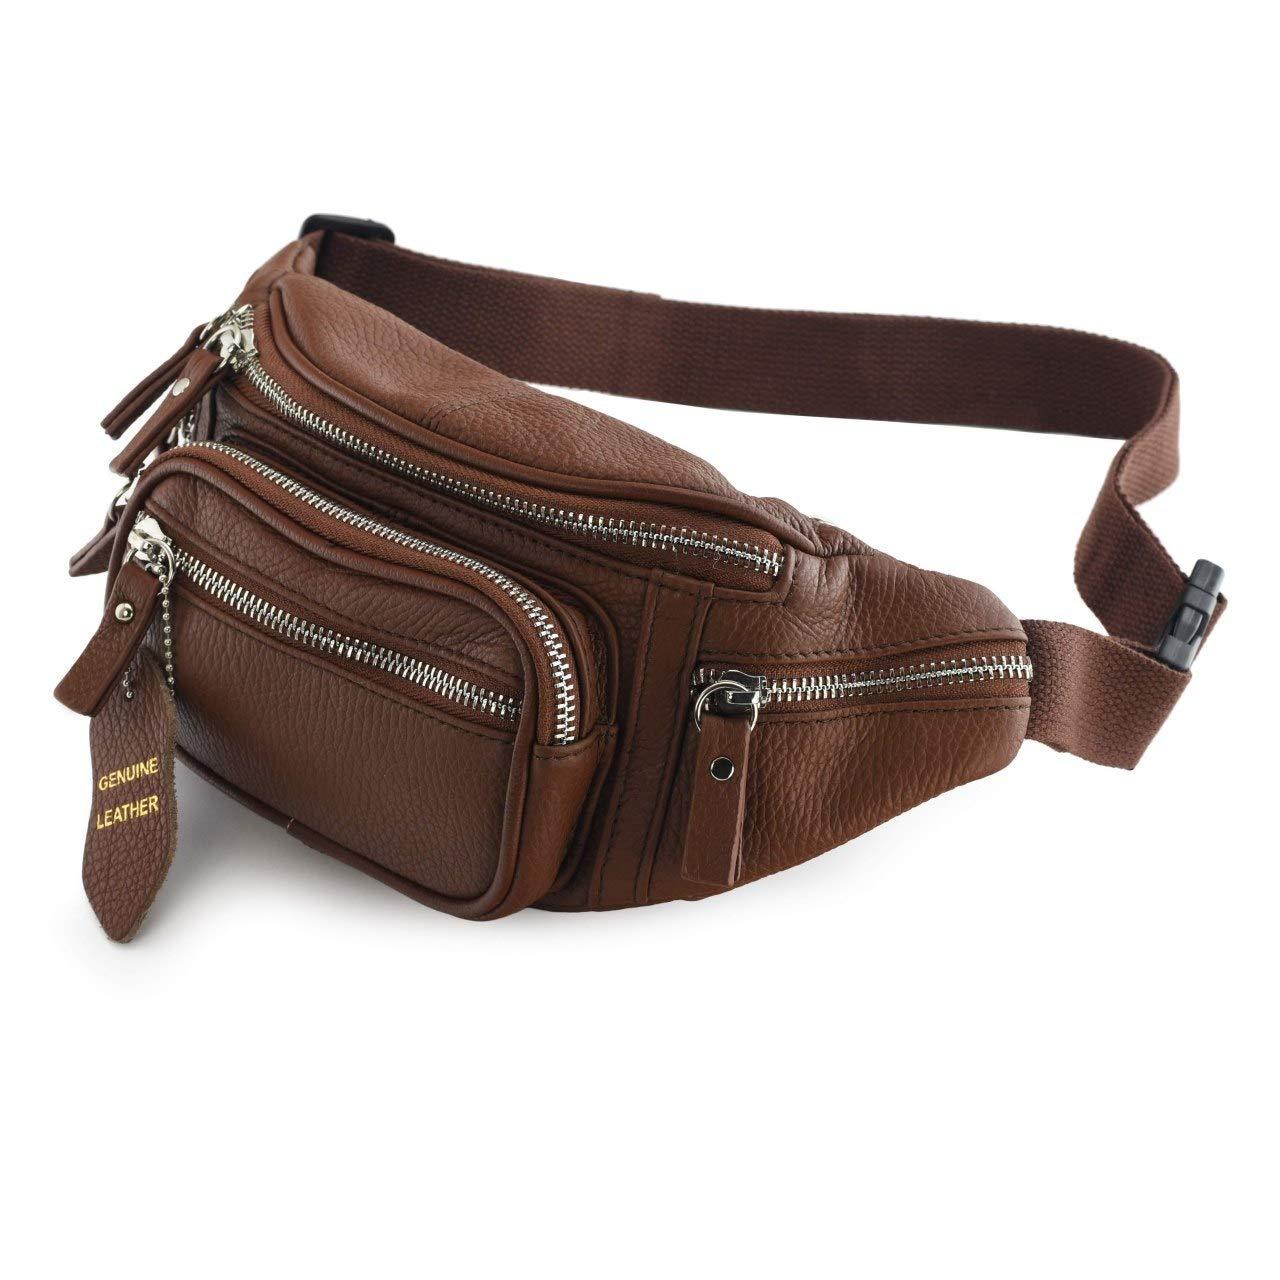 Nabob 皮革皮革皮革革包(黑色或棕色) - 男女多功能包旅行袋 - 多个口袋和结实的拉链 非常适合徒步骑行等穿着